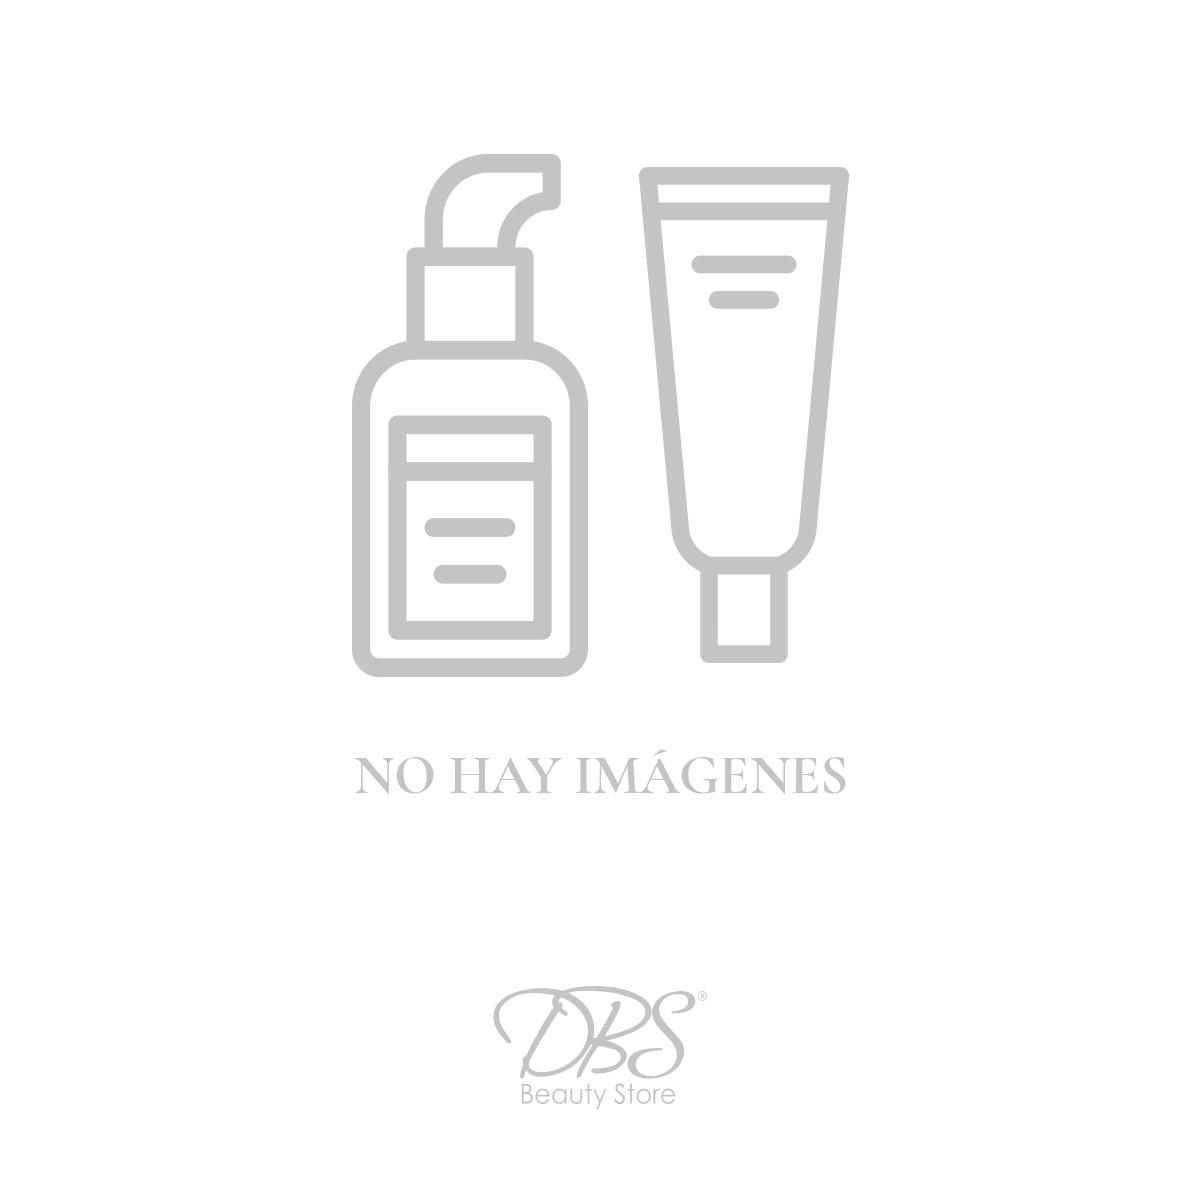 body-luxuries-BL-BN07608.jpg